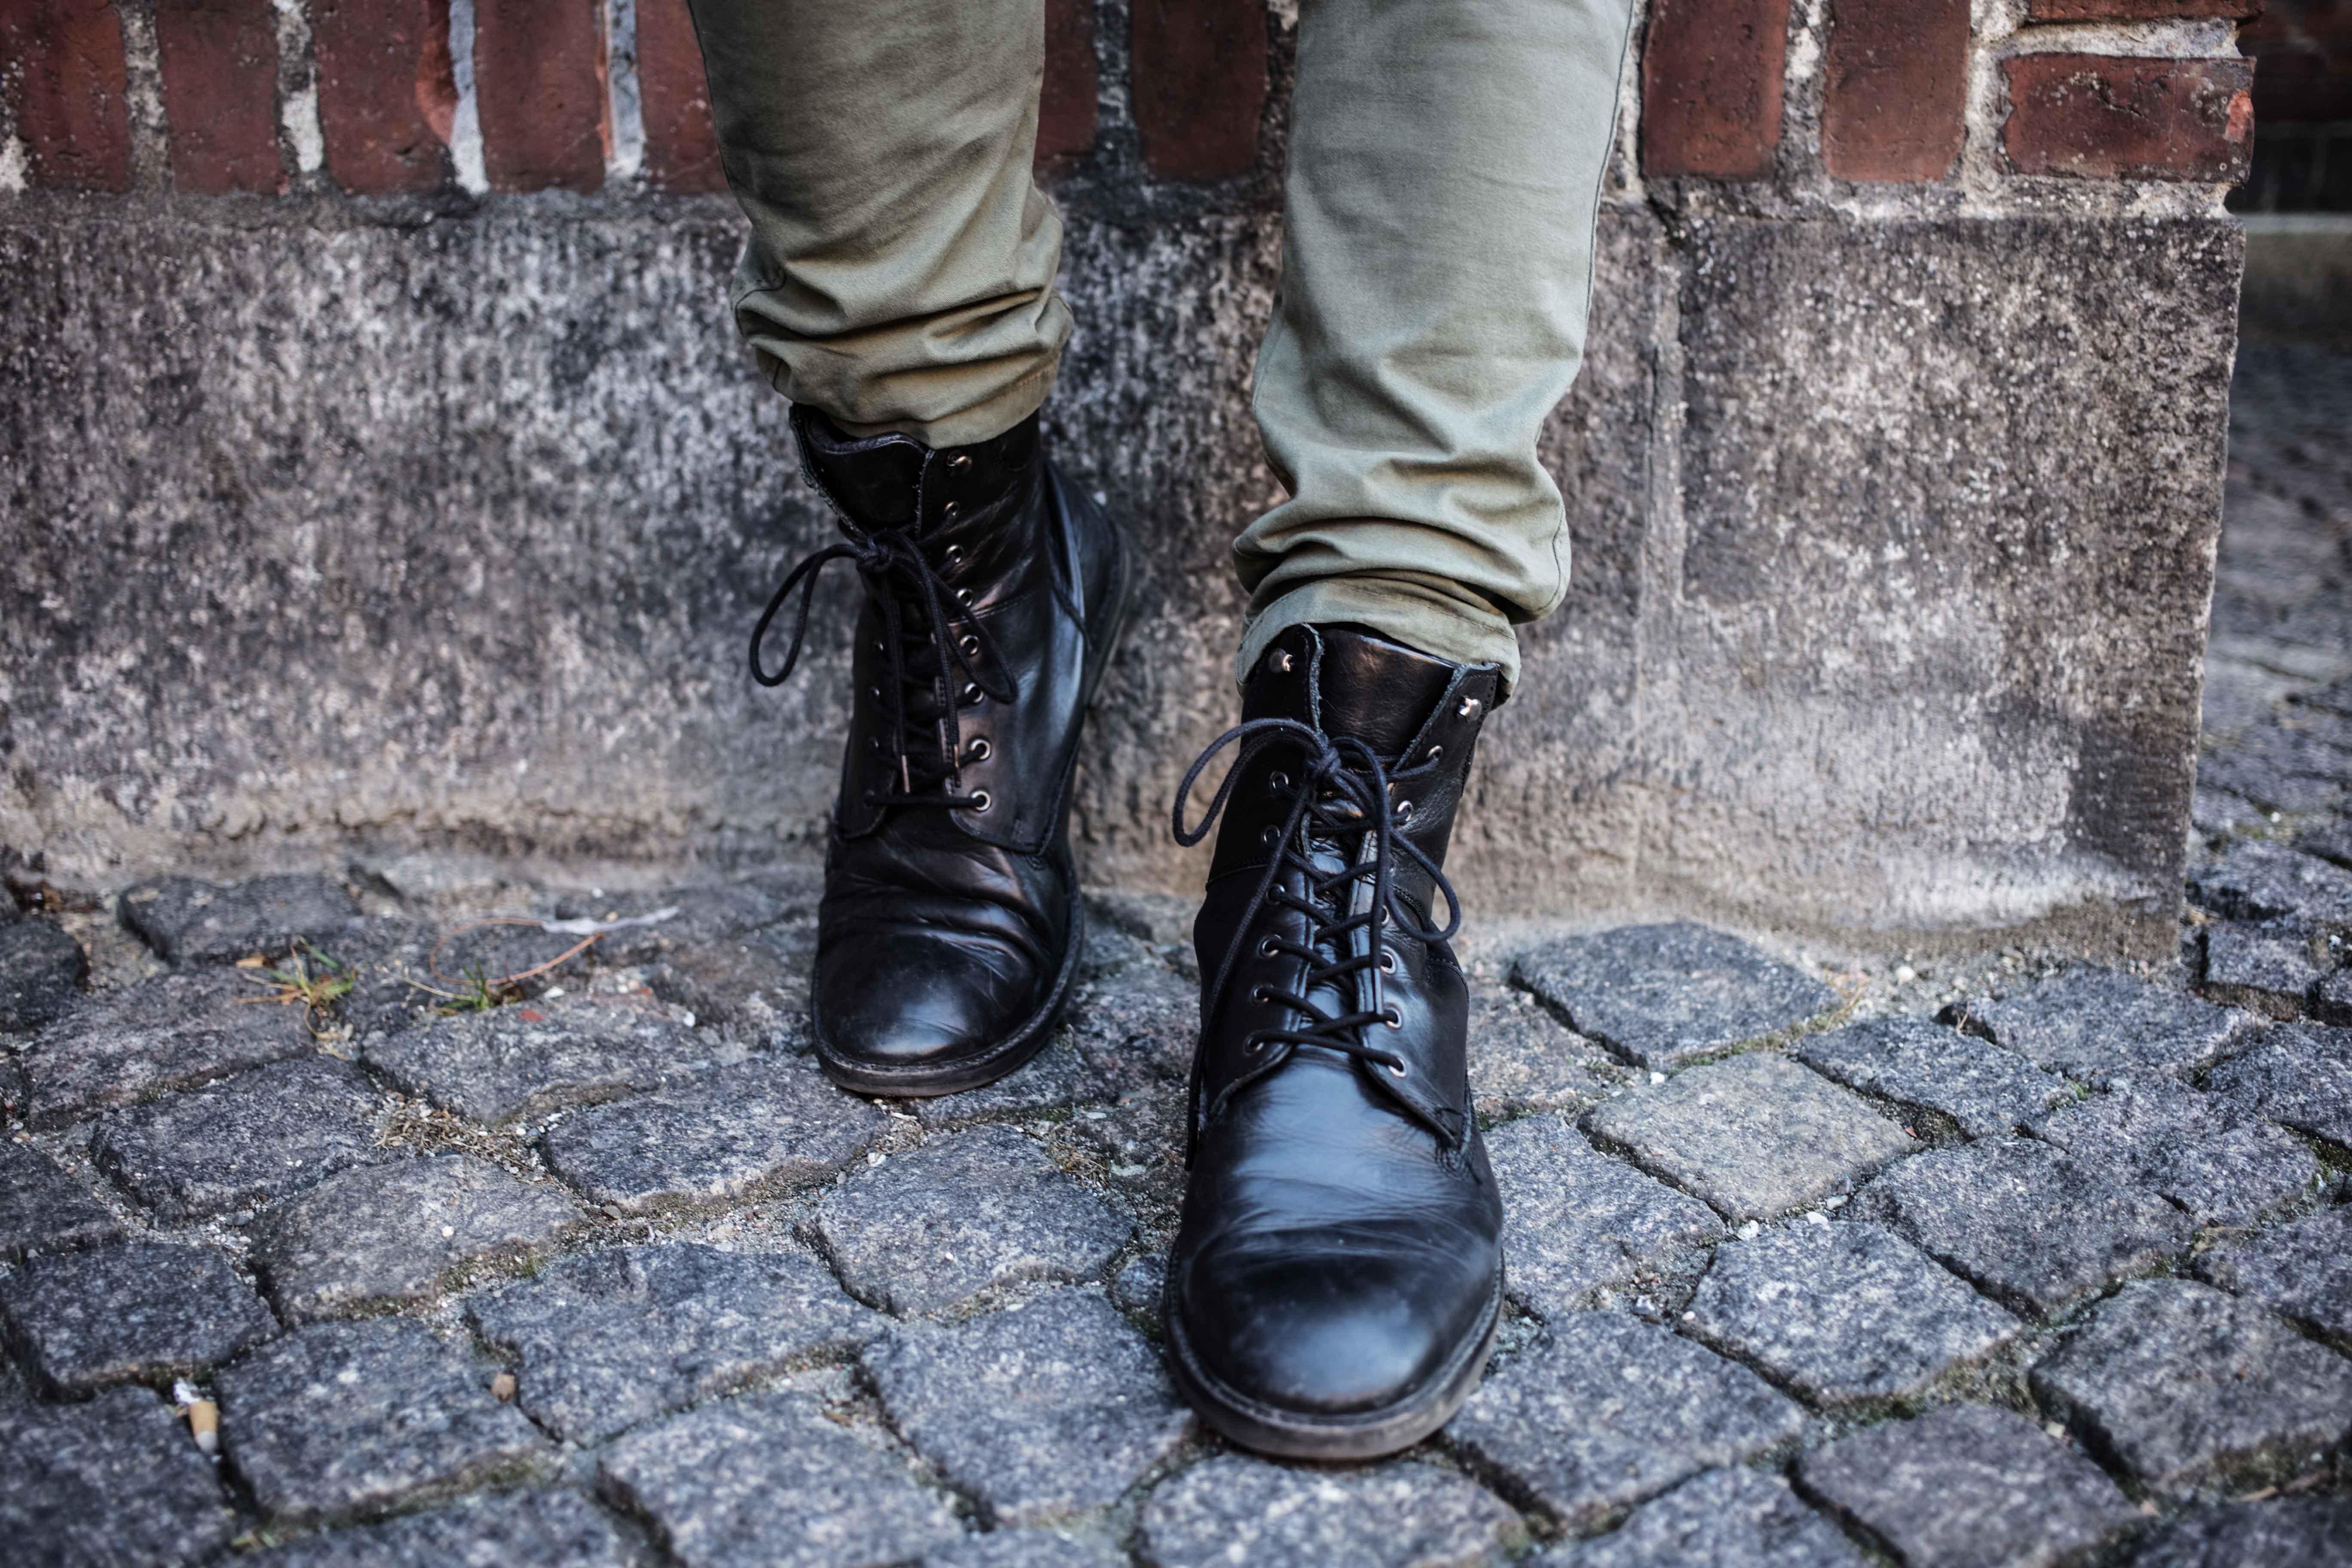 trashed-pullover-schwarze-lederjacke-olivgruene-chino-grunge-look_6074